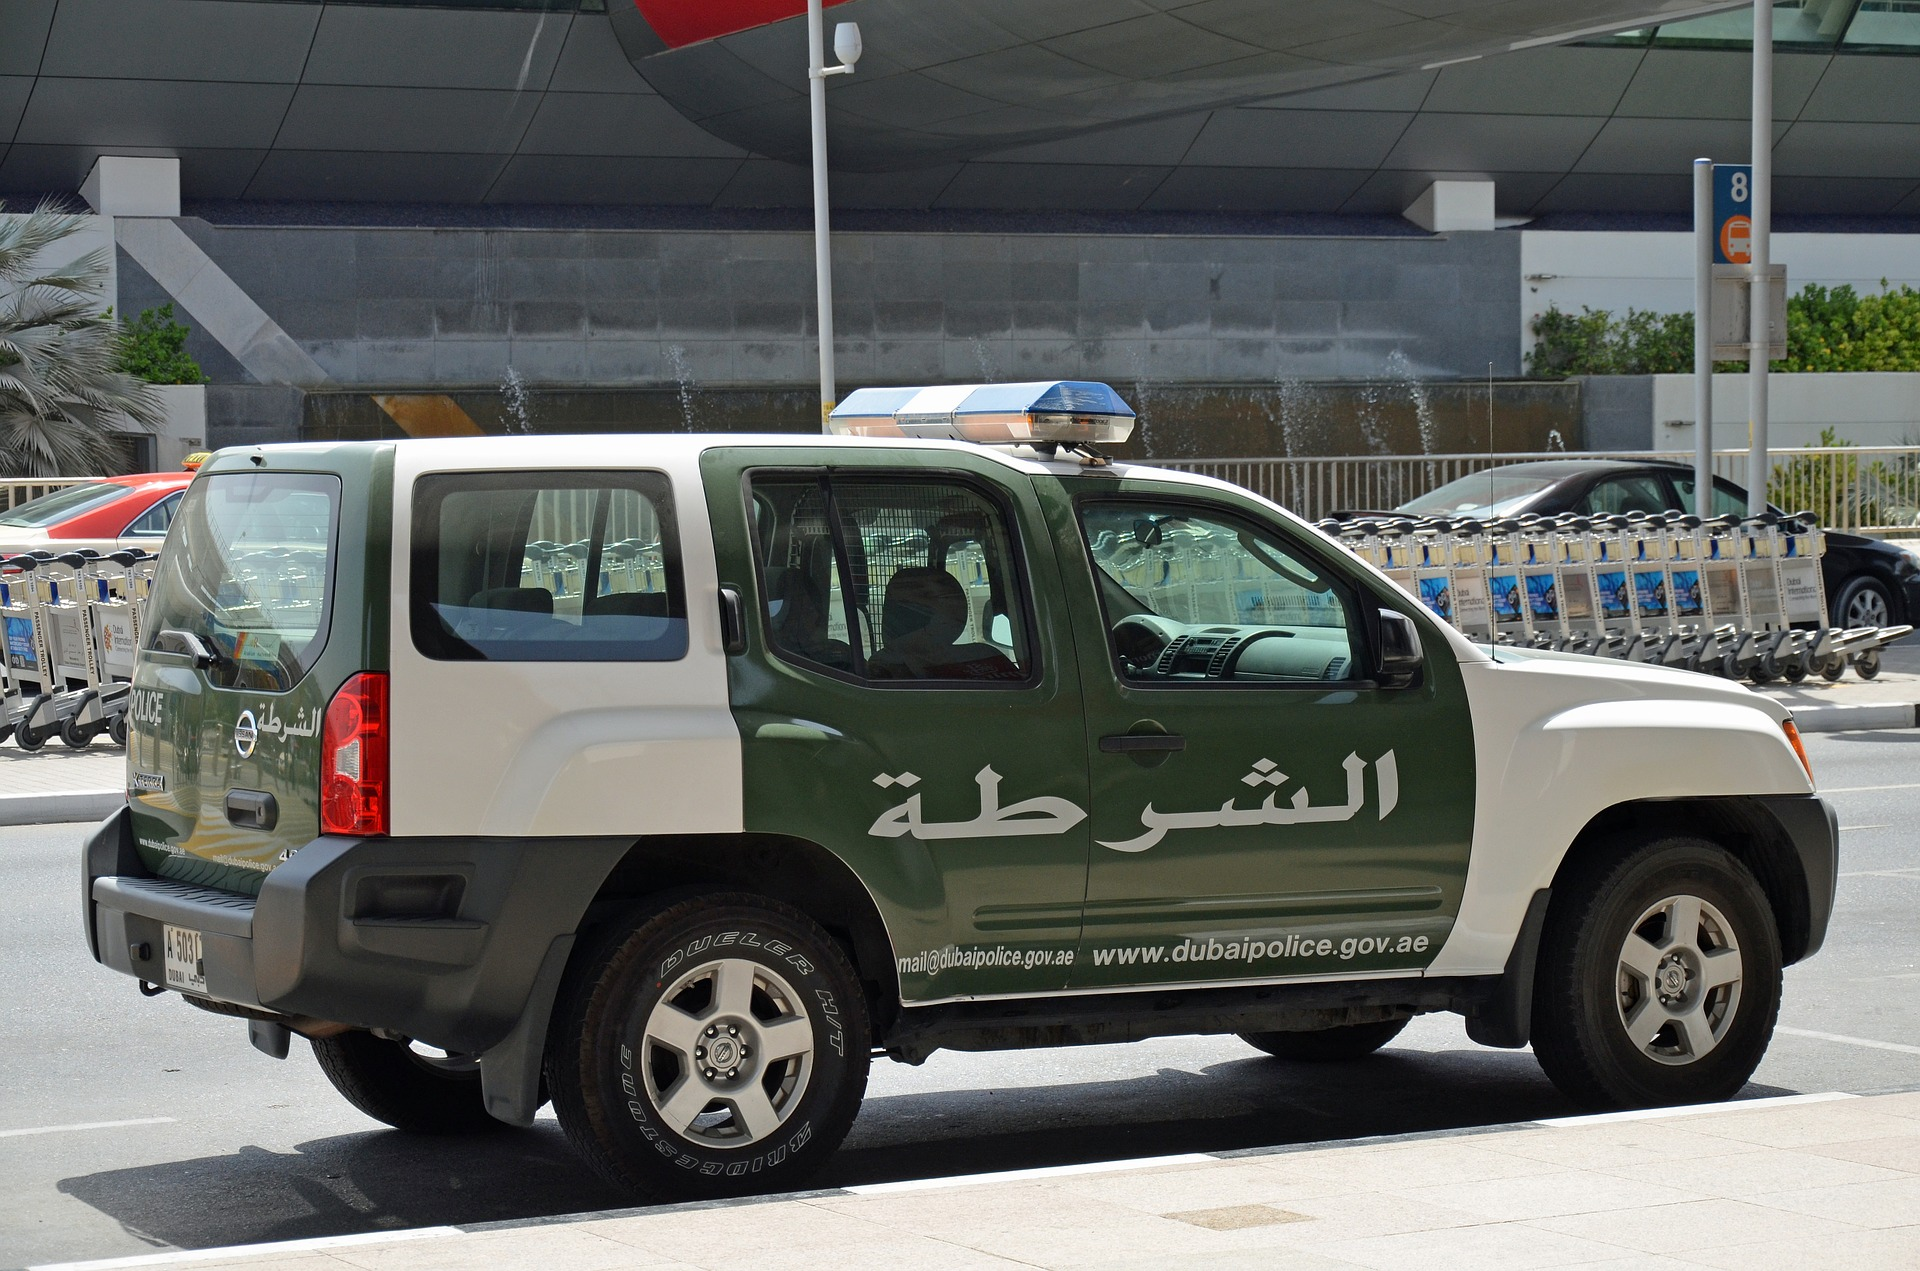 French drug smuggler Bouchibi arrested by Dubai Police